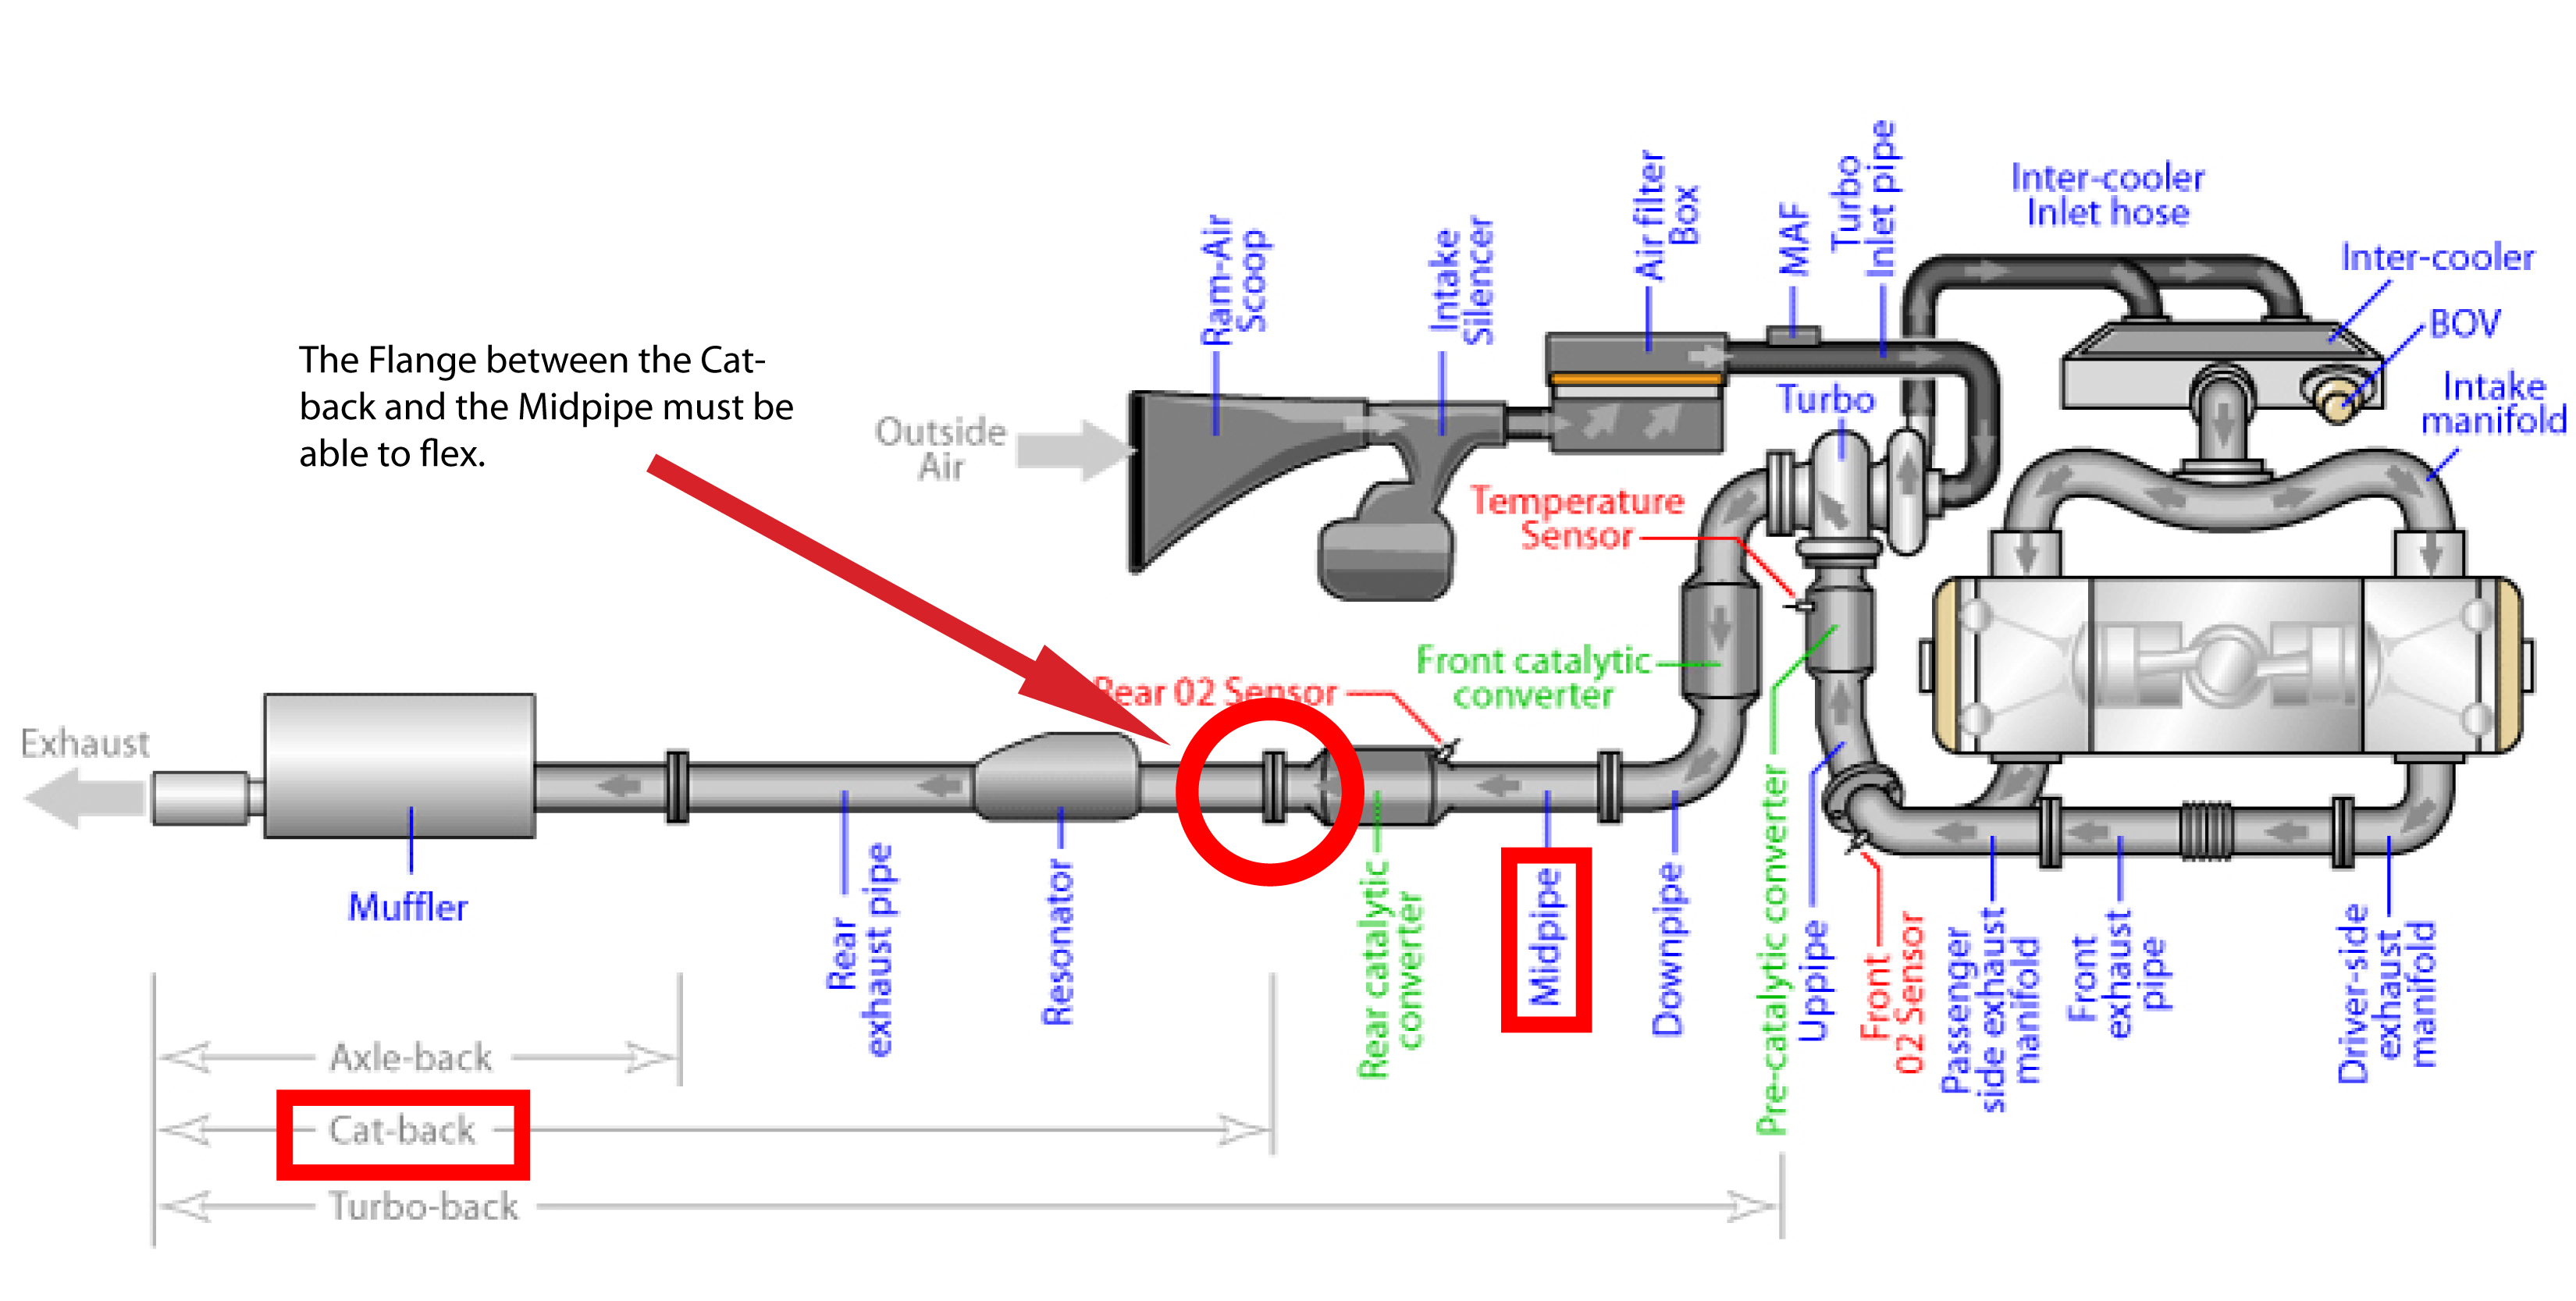 2002 wrx exhaust diagram diagram data schema 1997 subaru forester exhaust diagram [ 3300 x 1667 Pixel ]